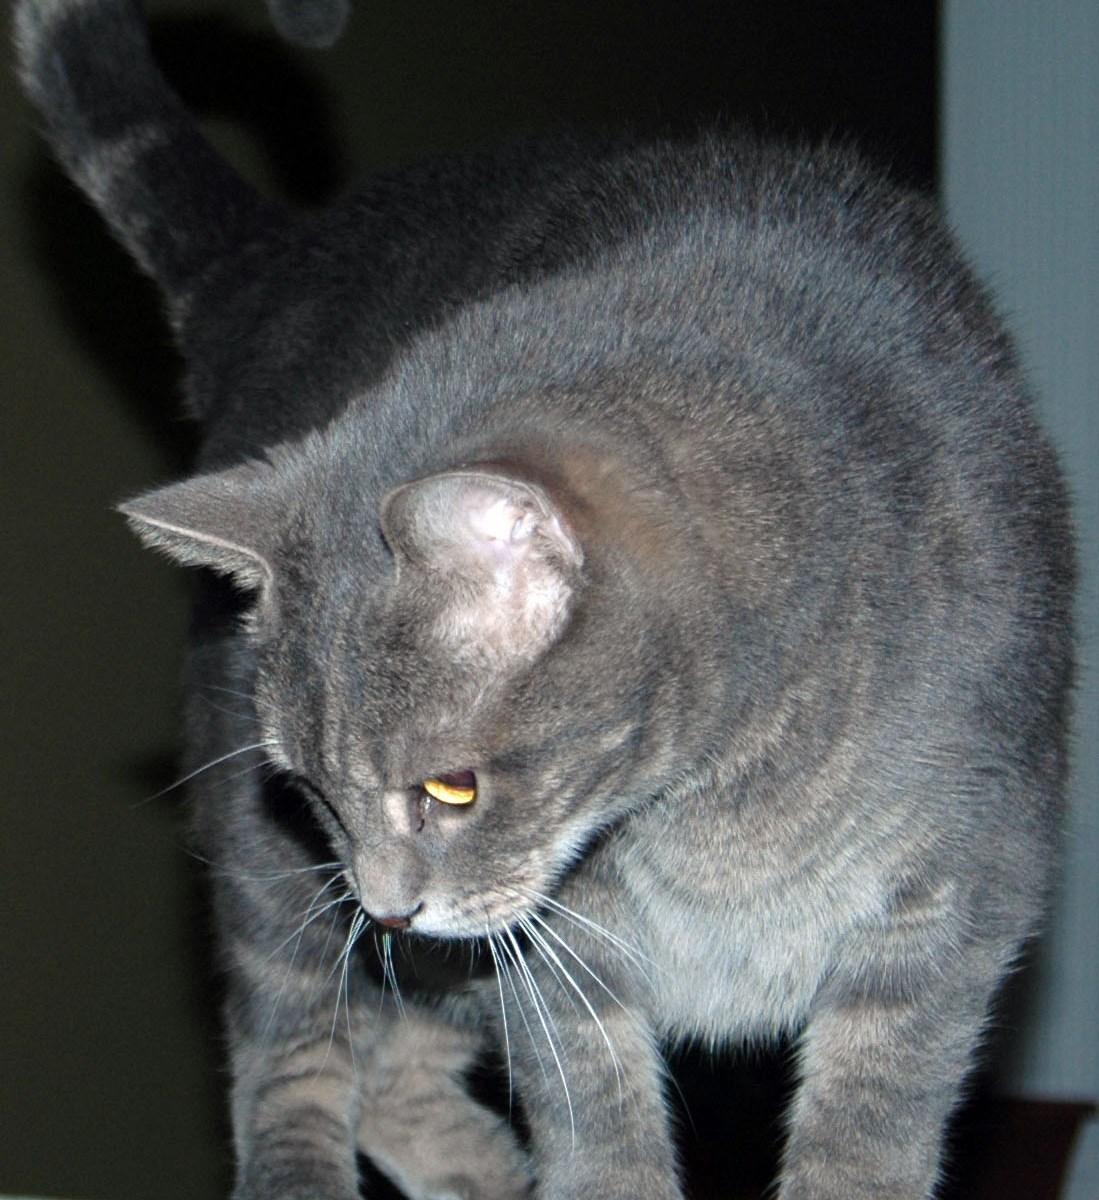 Bagheera the Diabetic Cat on the Catwalk